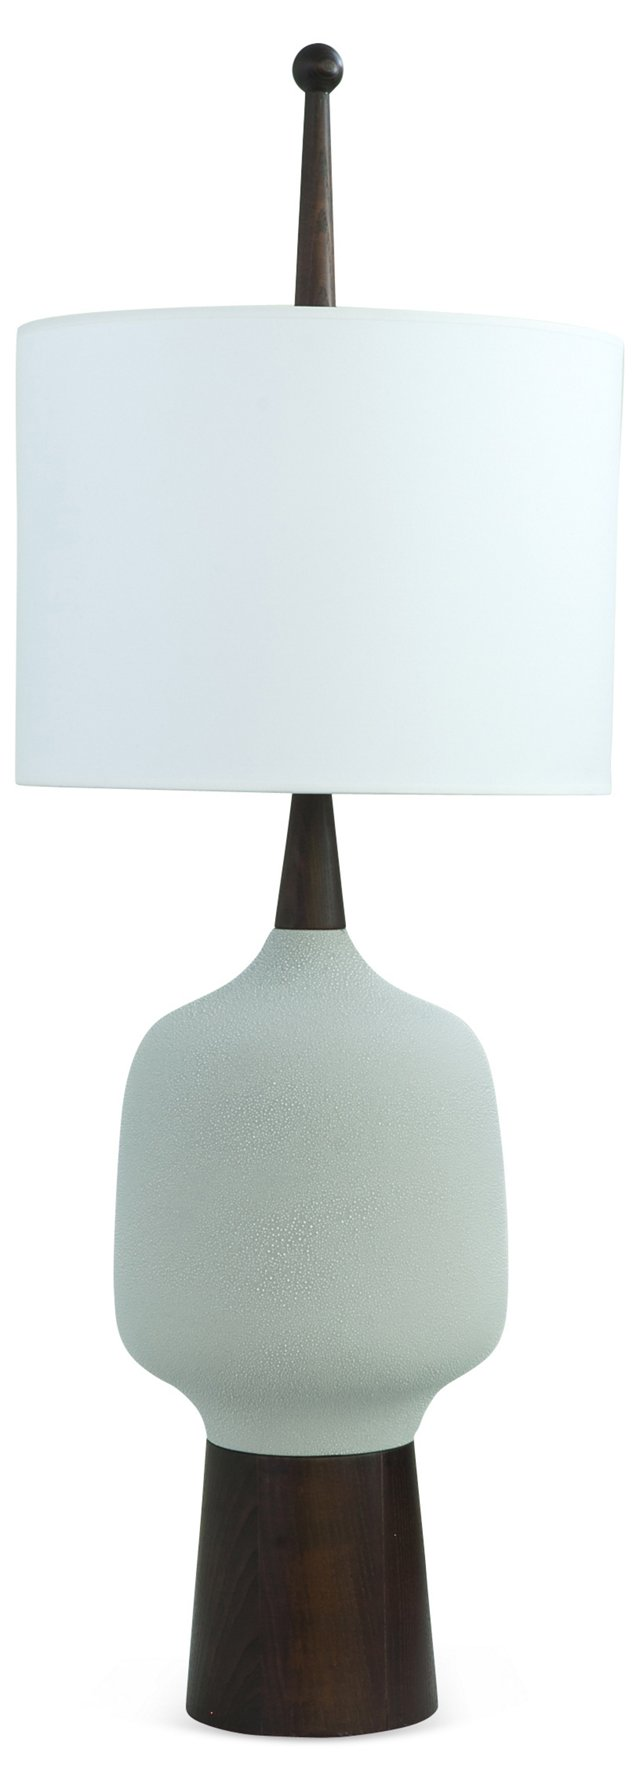 Tall Delano Table Lamp